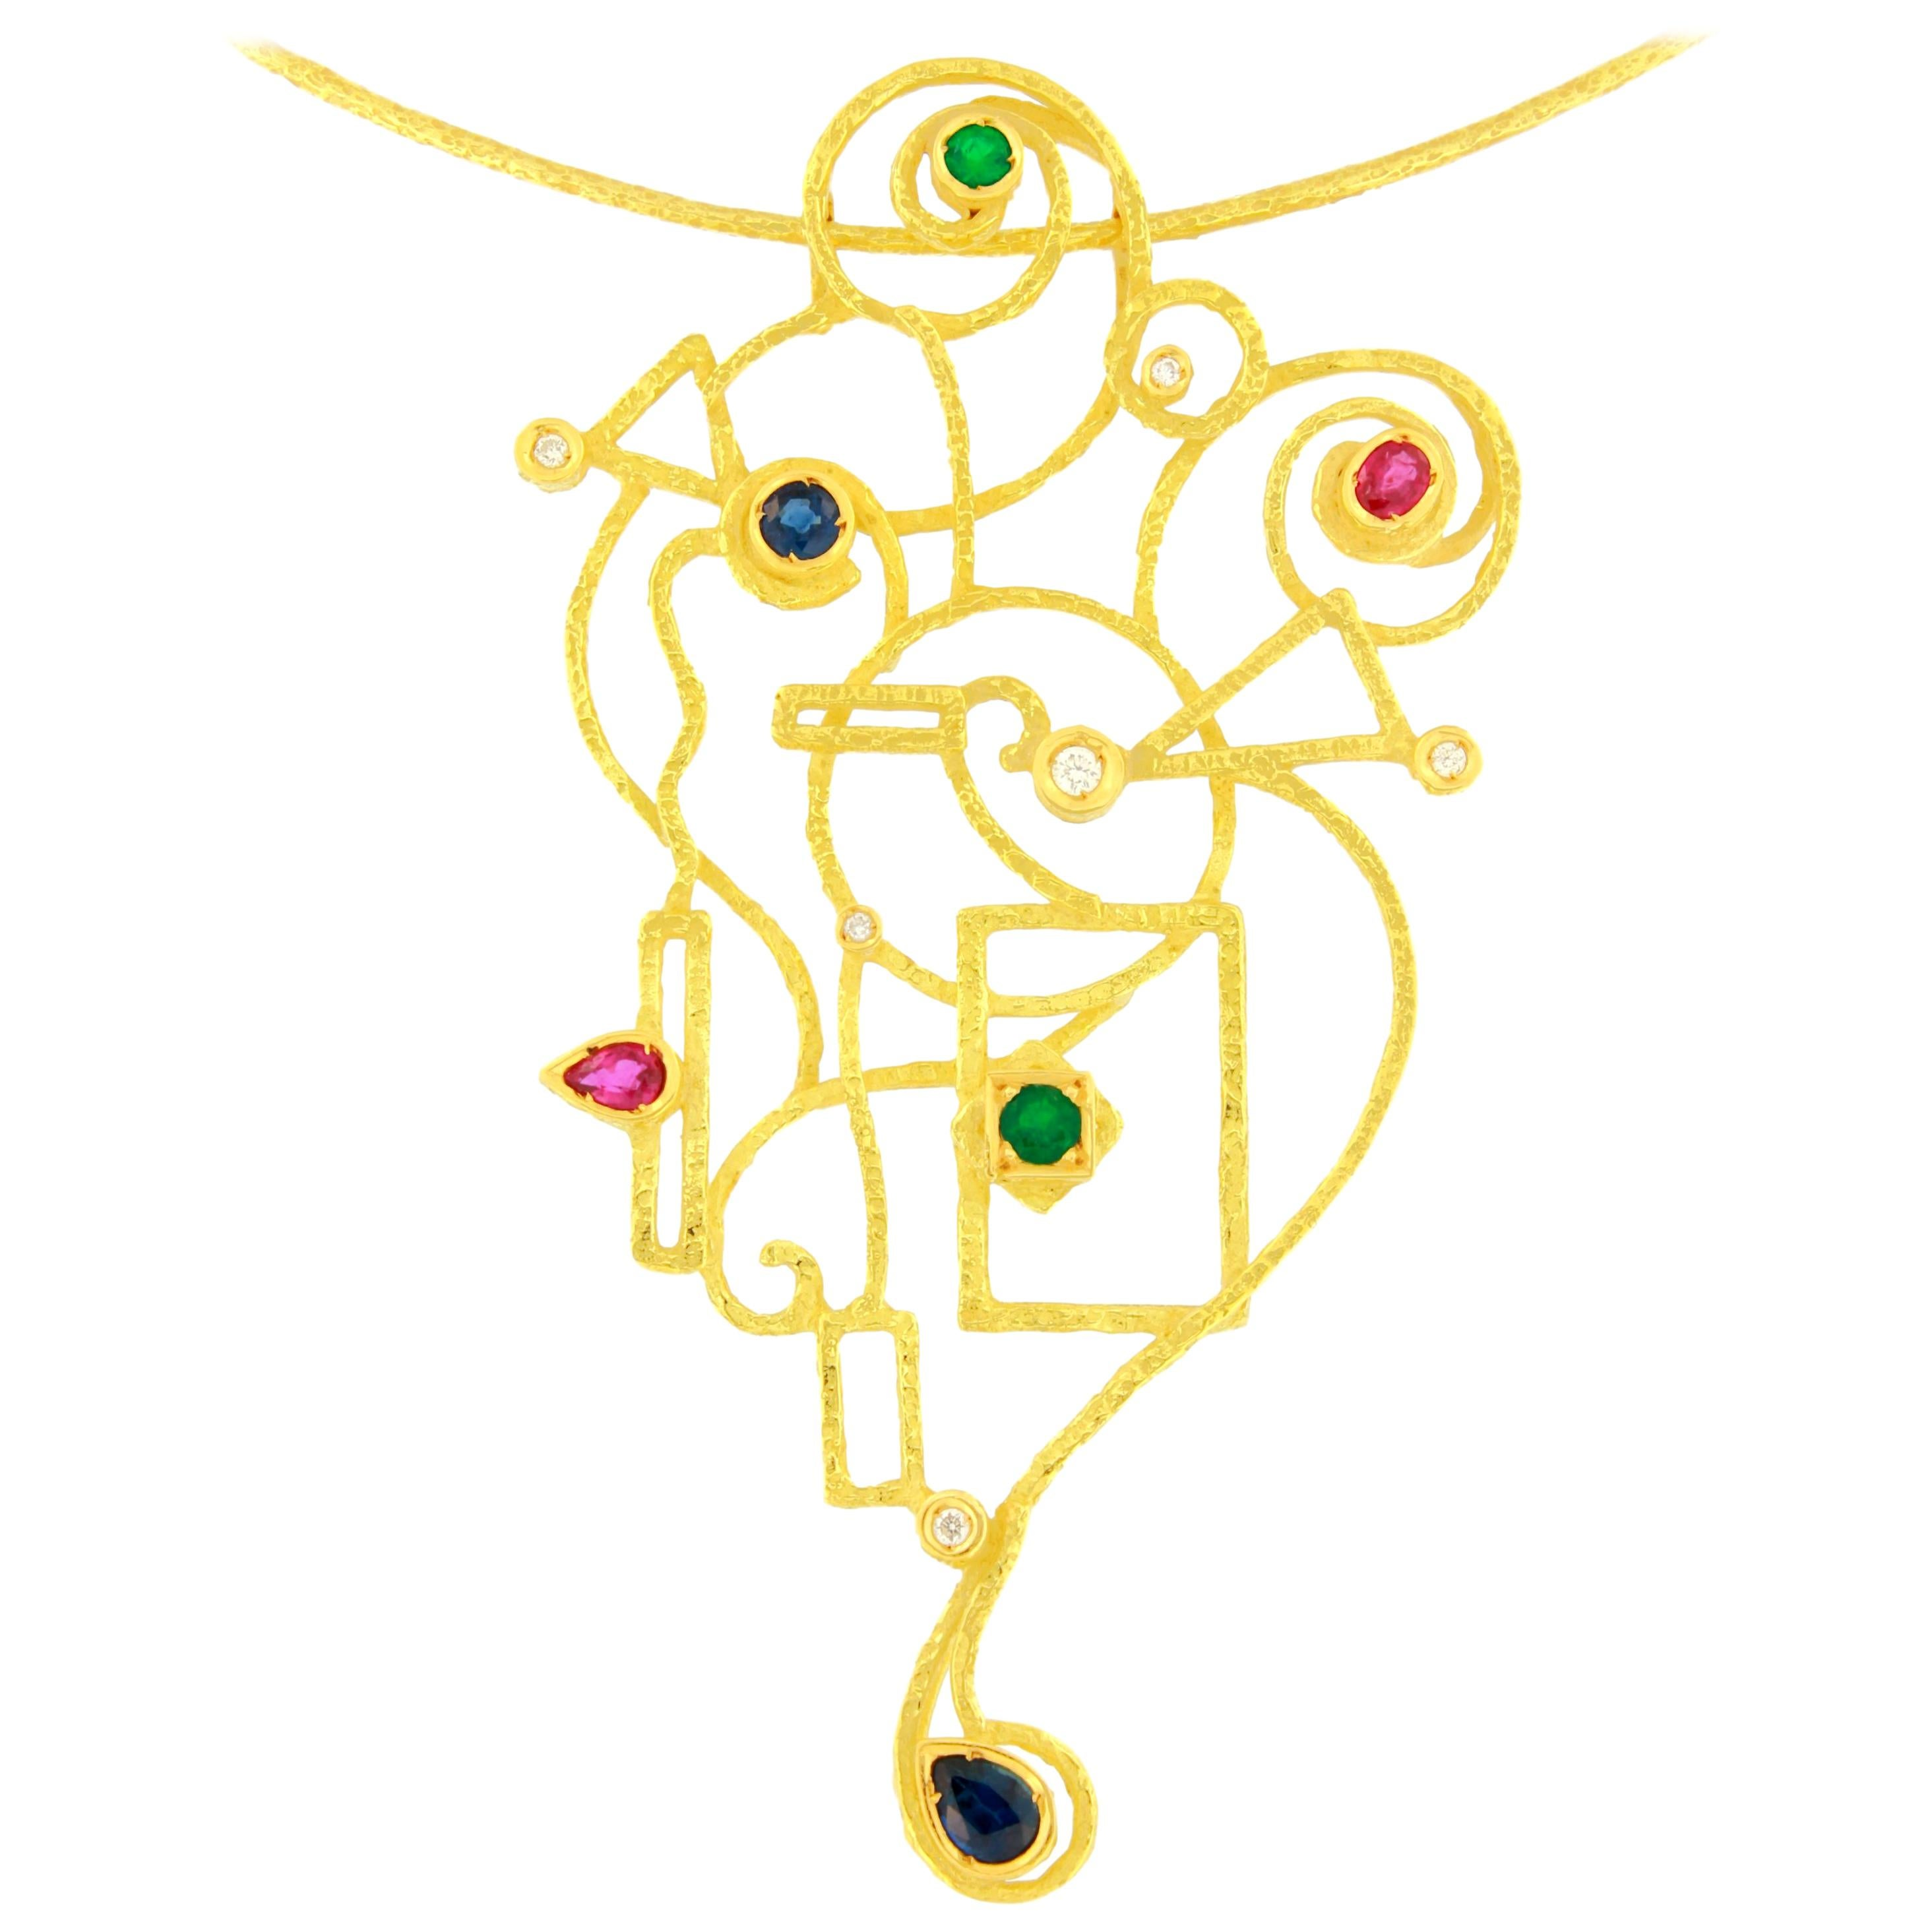 Sacchi Ruby Emerald Shapphire Gemstones 18 Karat Yellow Gold Necklace